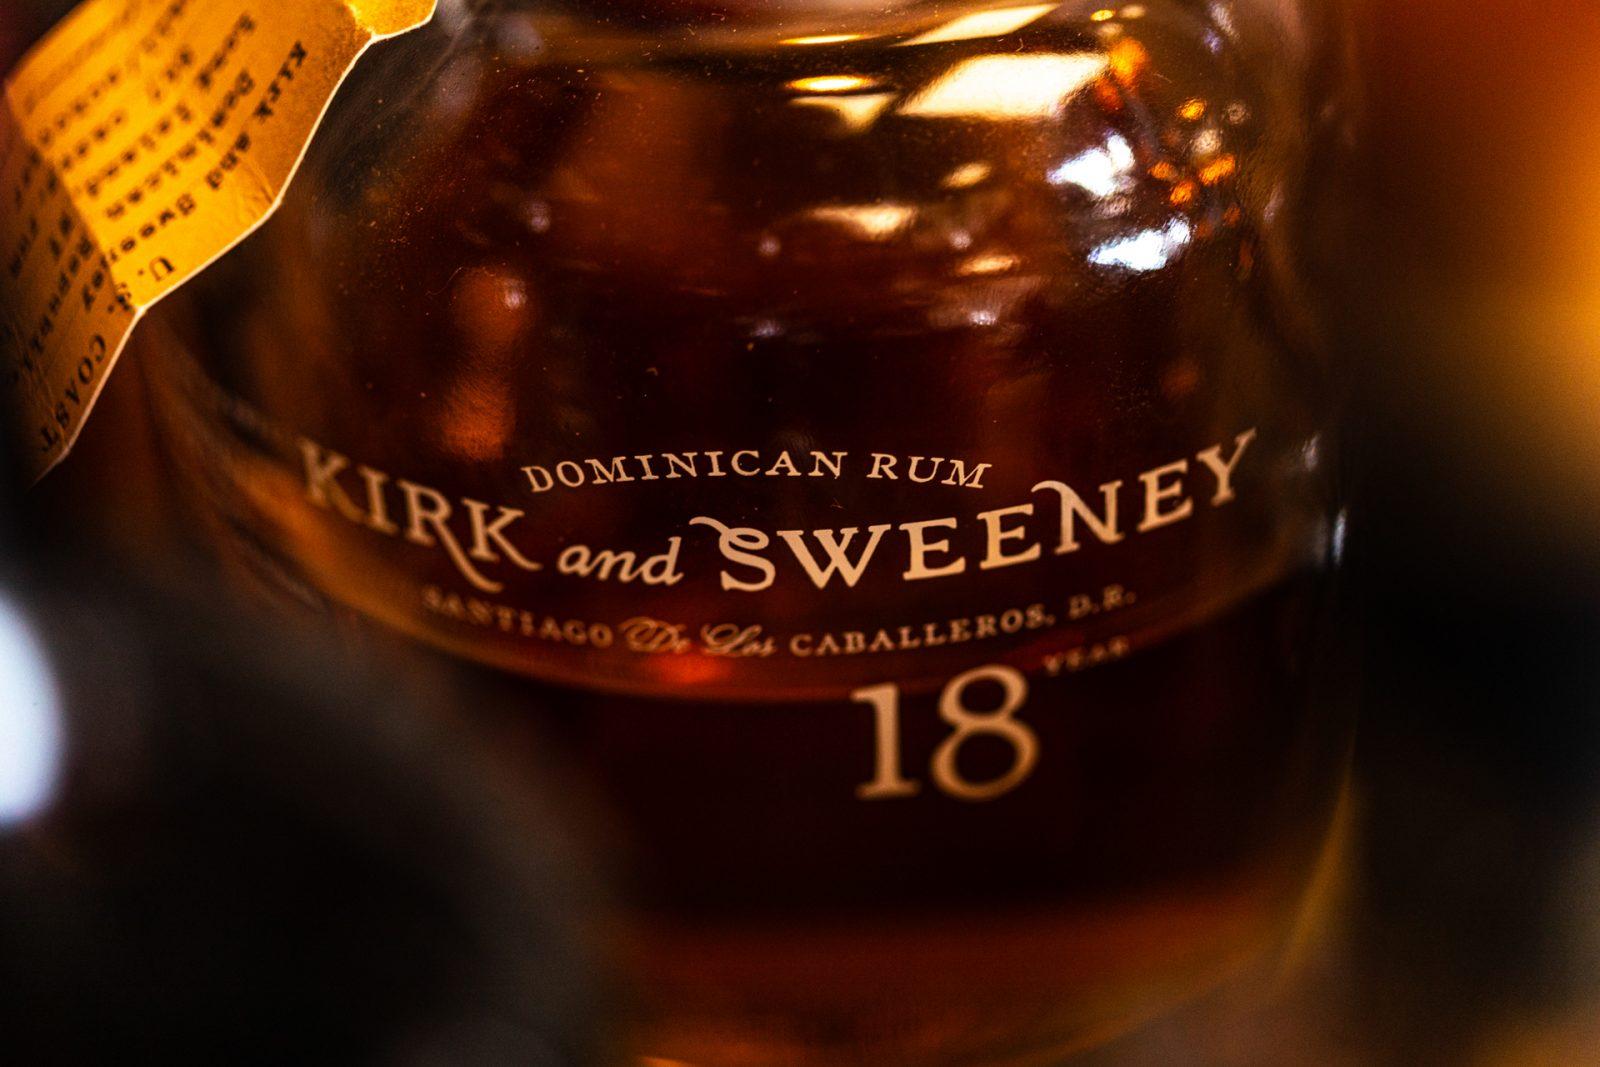 Grand choix de whisky cave l'isle-jourdain gers